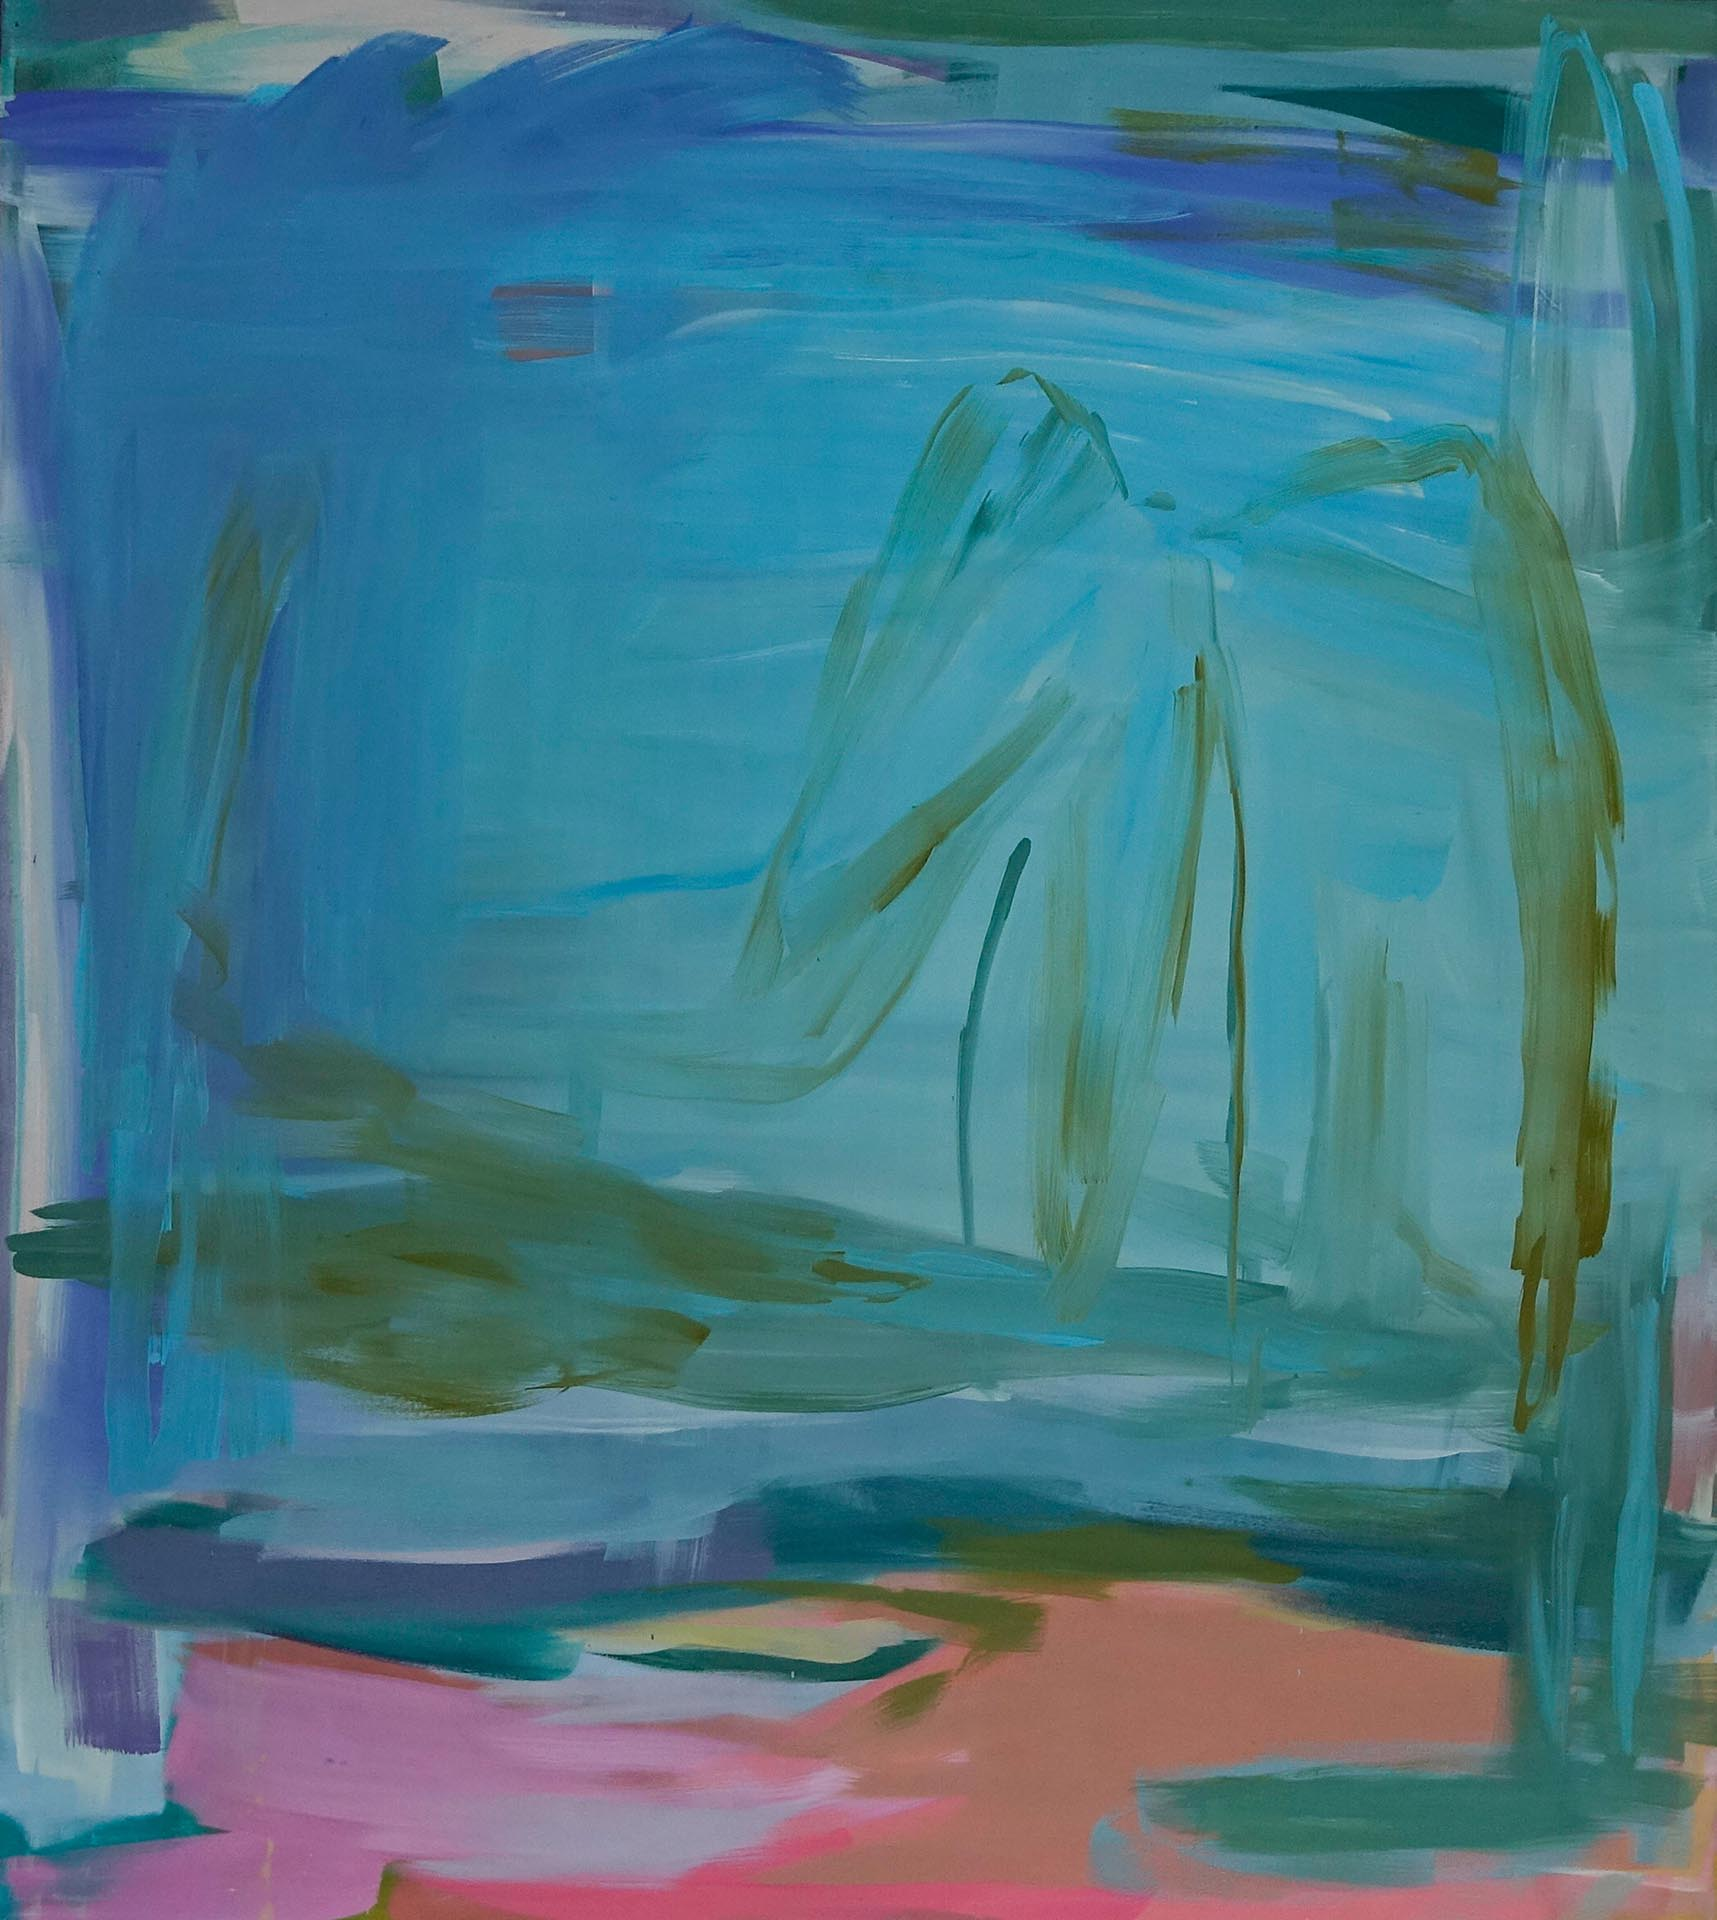 Violetta Ehnsperg | Erdbeerland | 150 x 170 cm | Galerie3